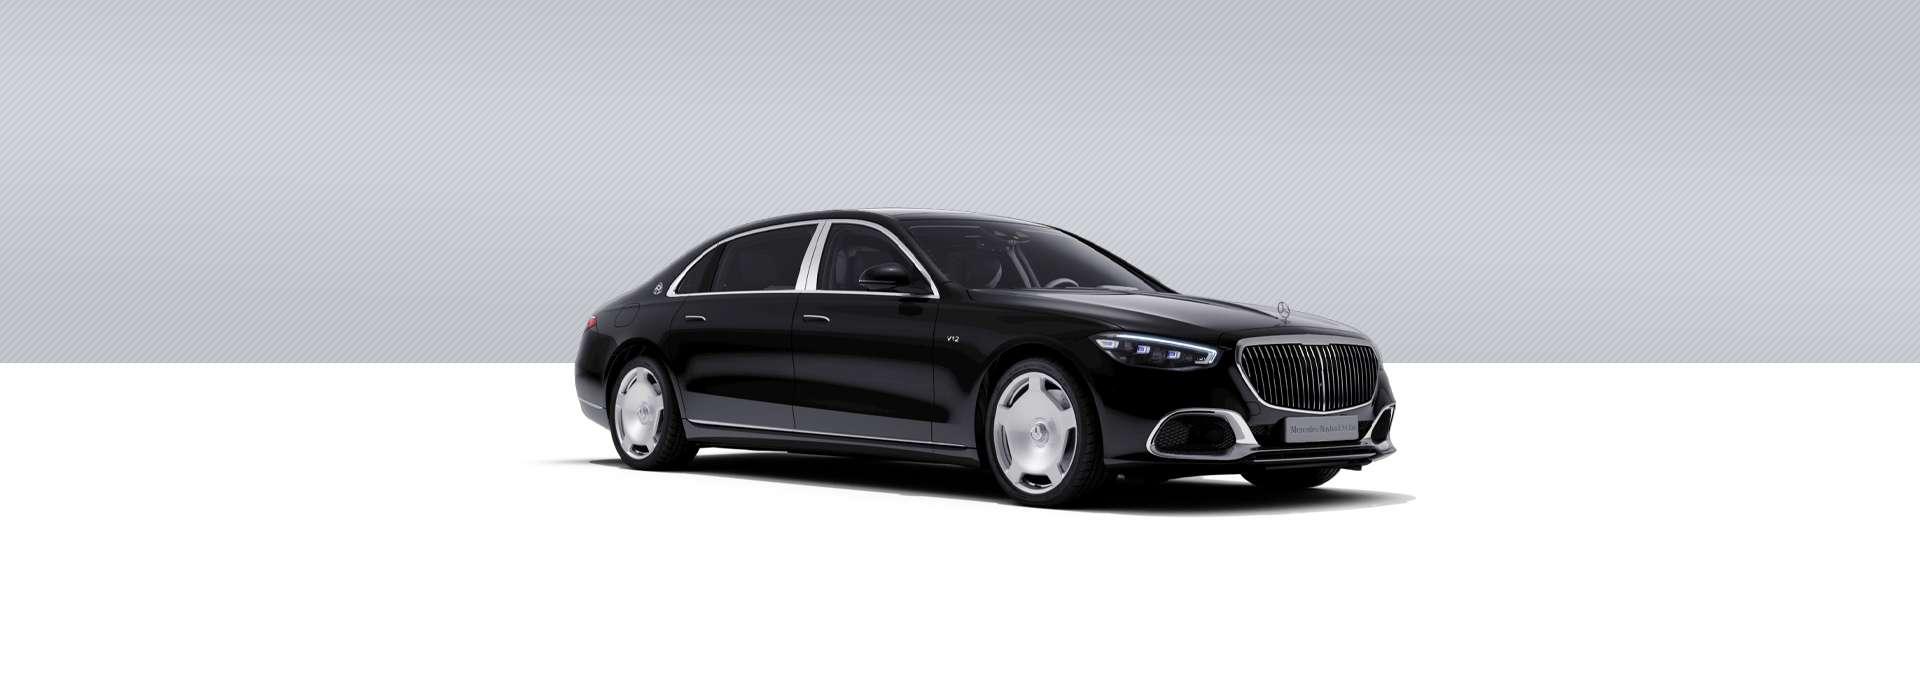 Mercedes Benz NUEVO CLASE S MERCEDES MAYBACH